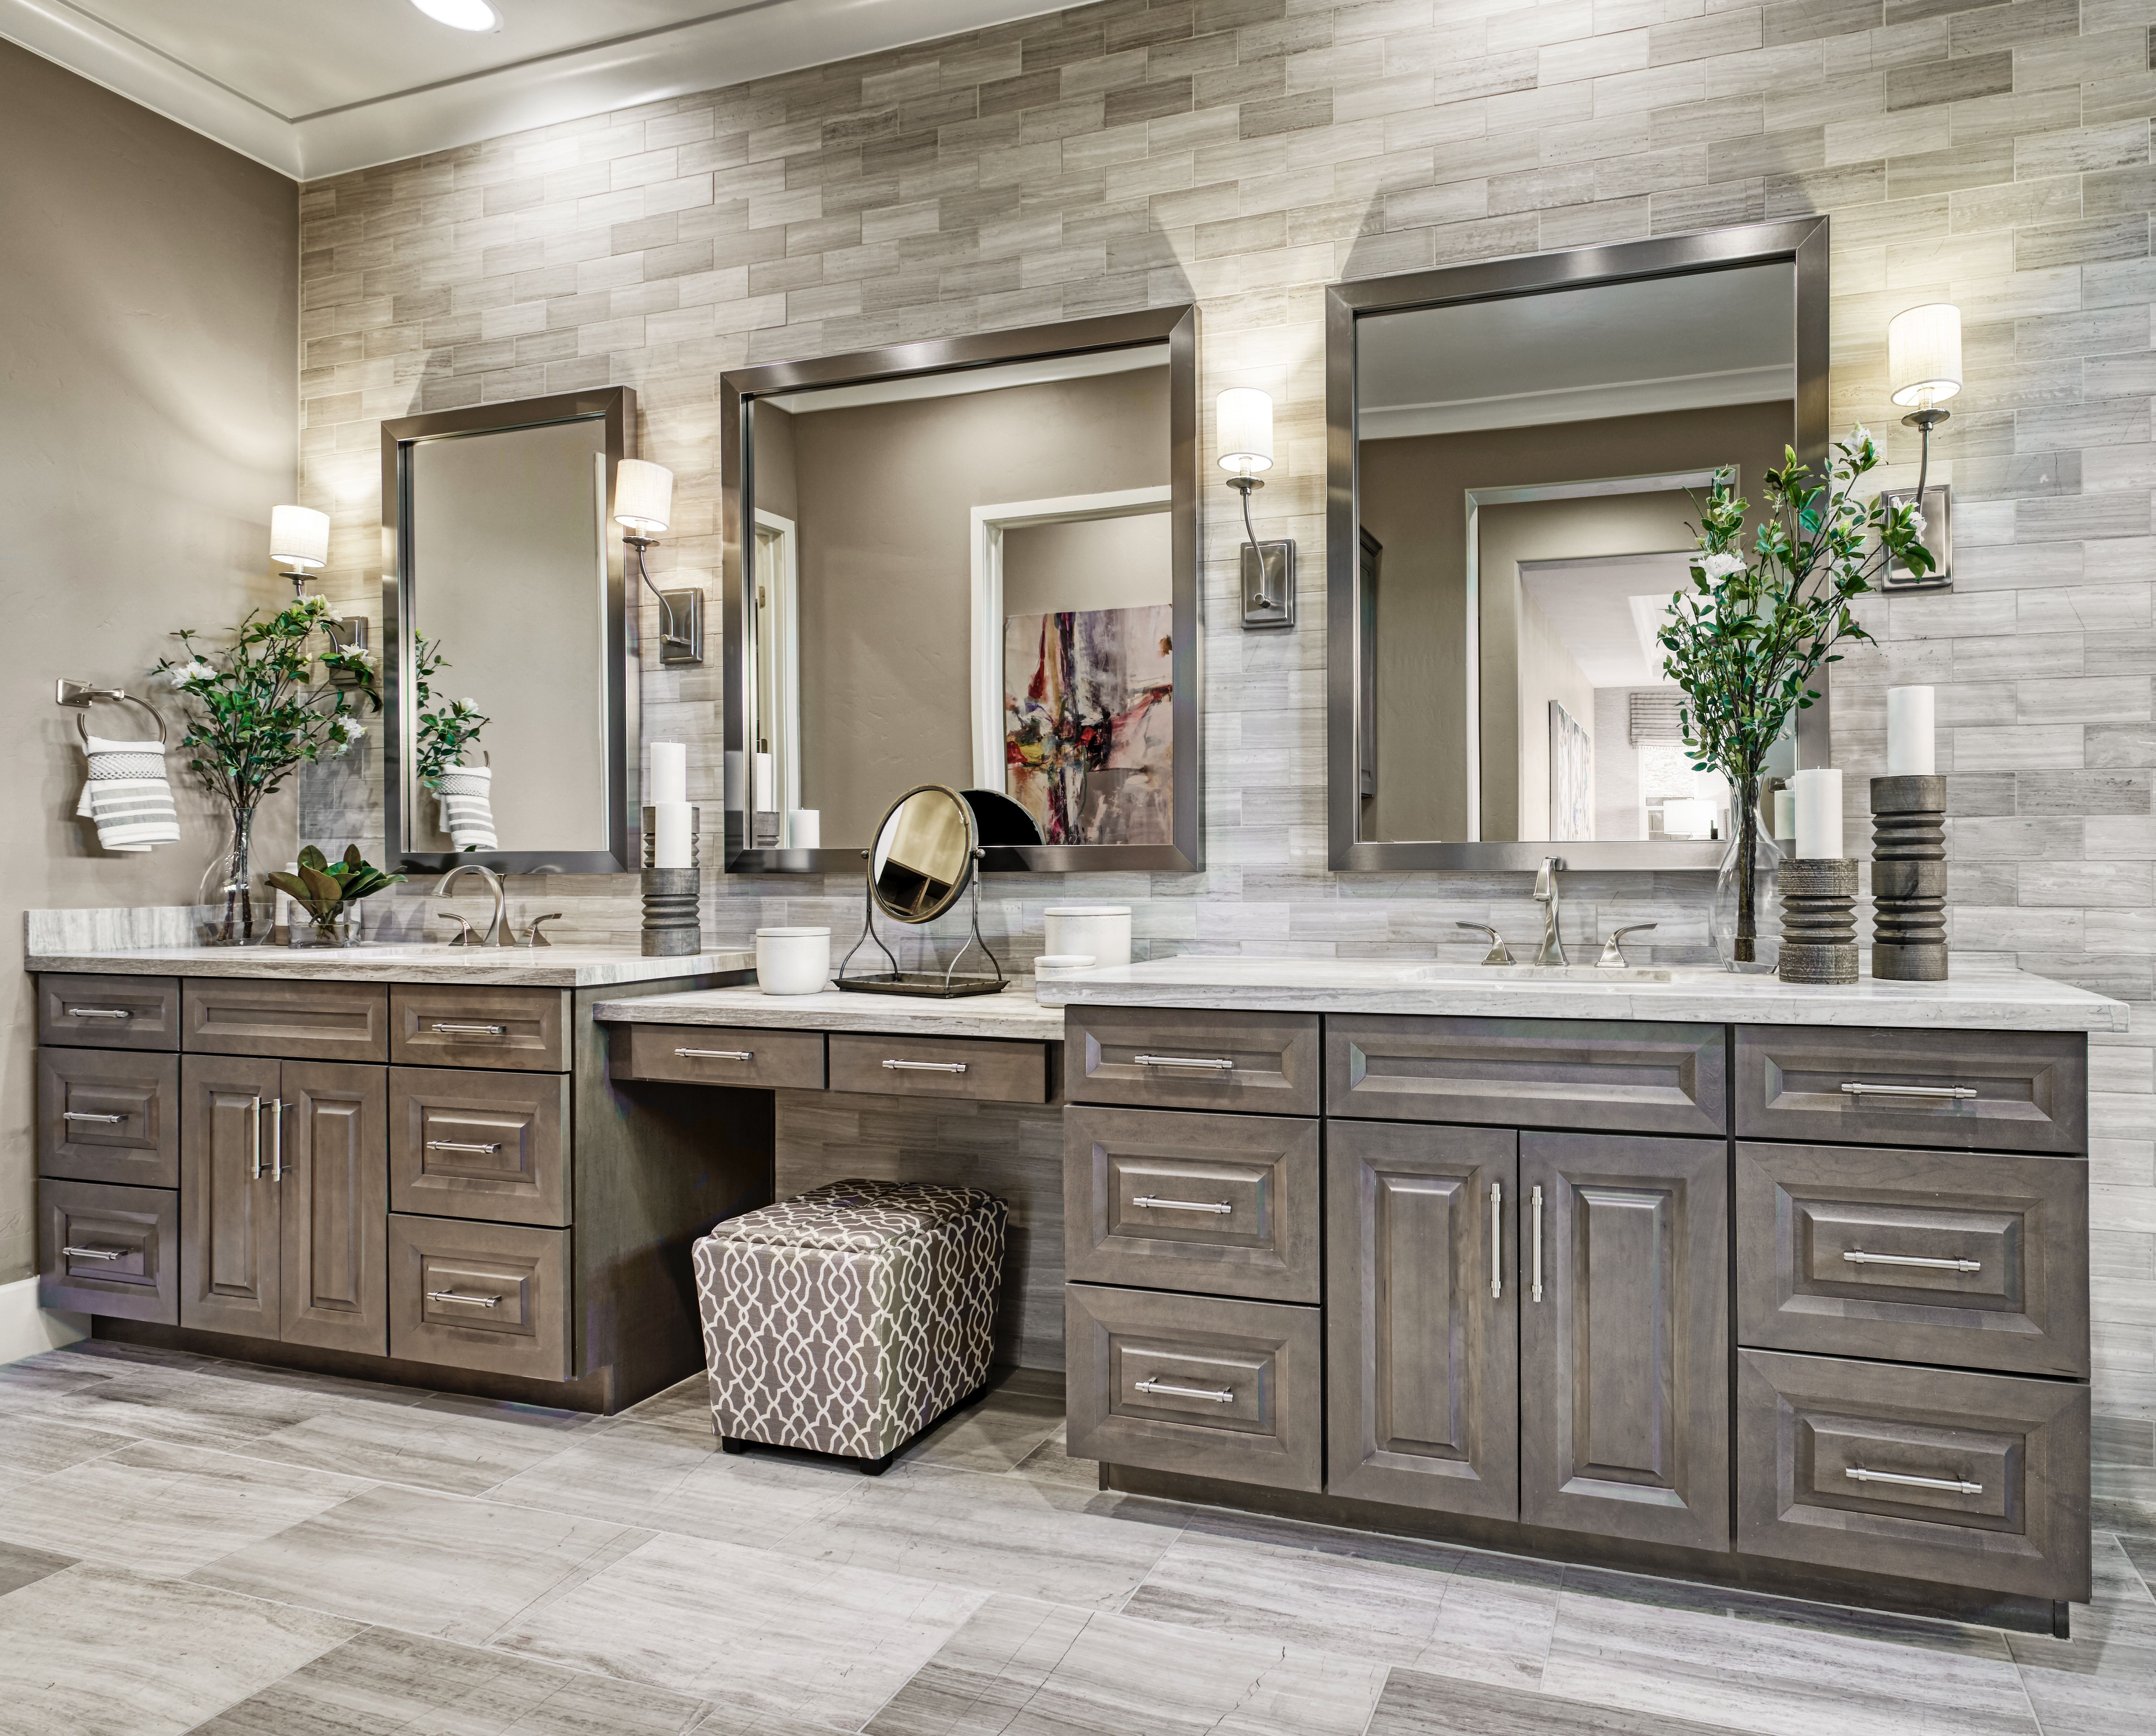 Master Bathroom Interior Design With Traditional Elegance Of Brushed Nickel Wall Scon Master Bedroom Interior Design Bathroom Interior Design Bathroom Interior